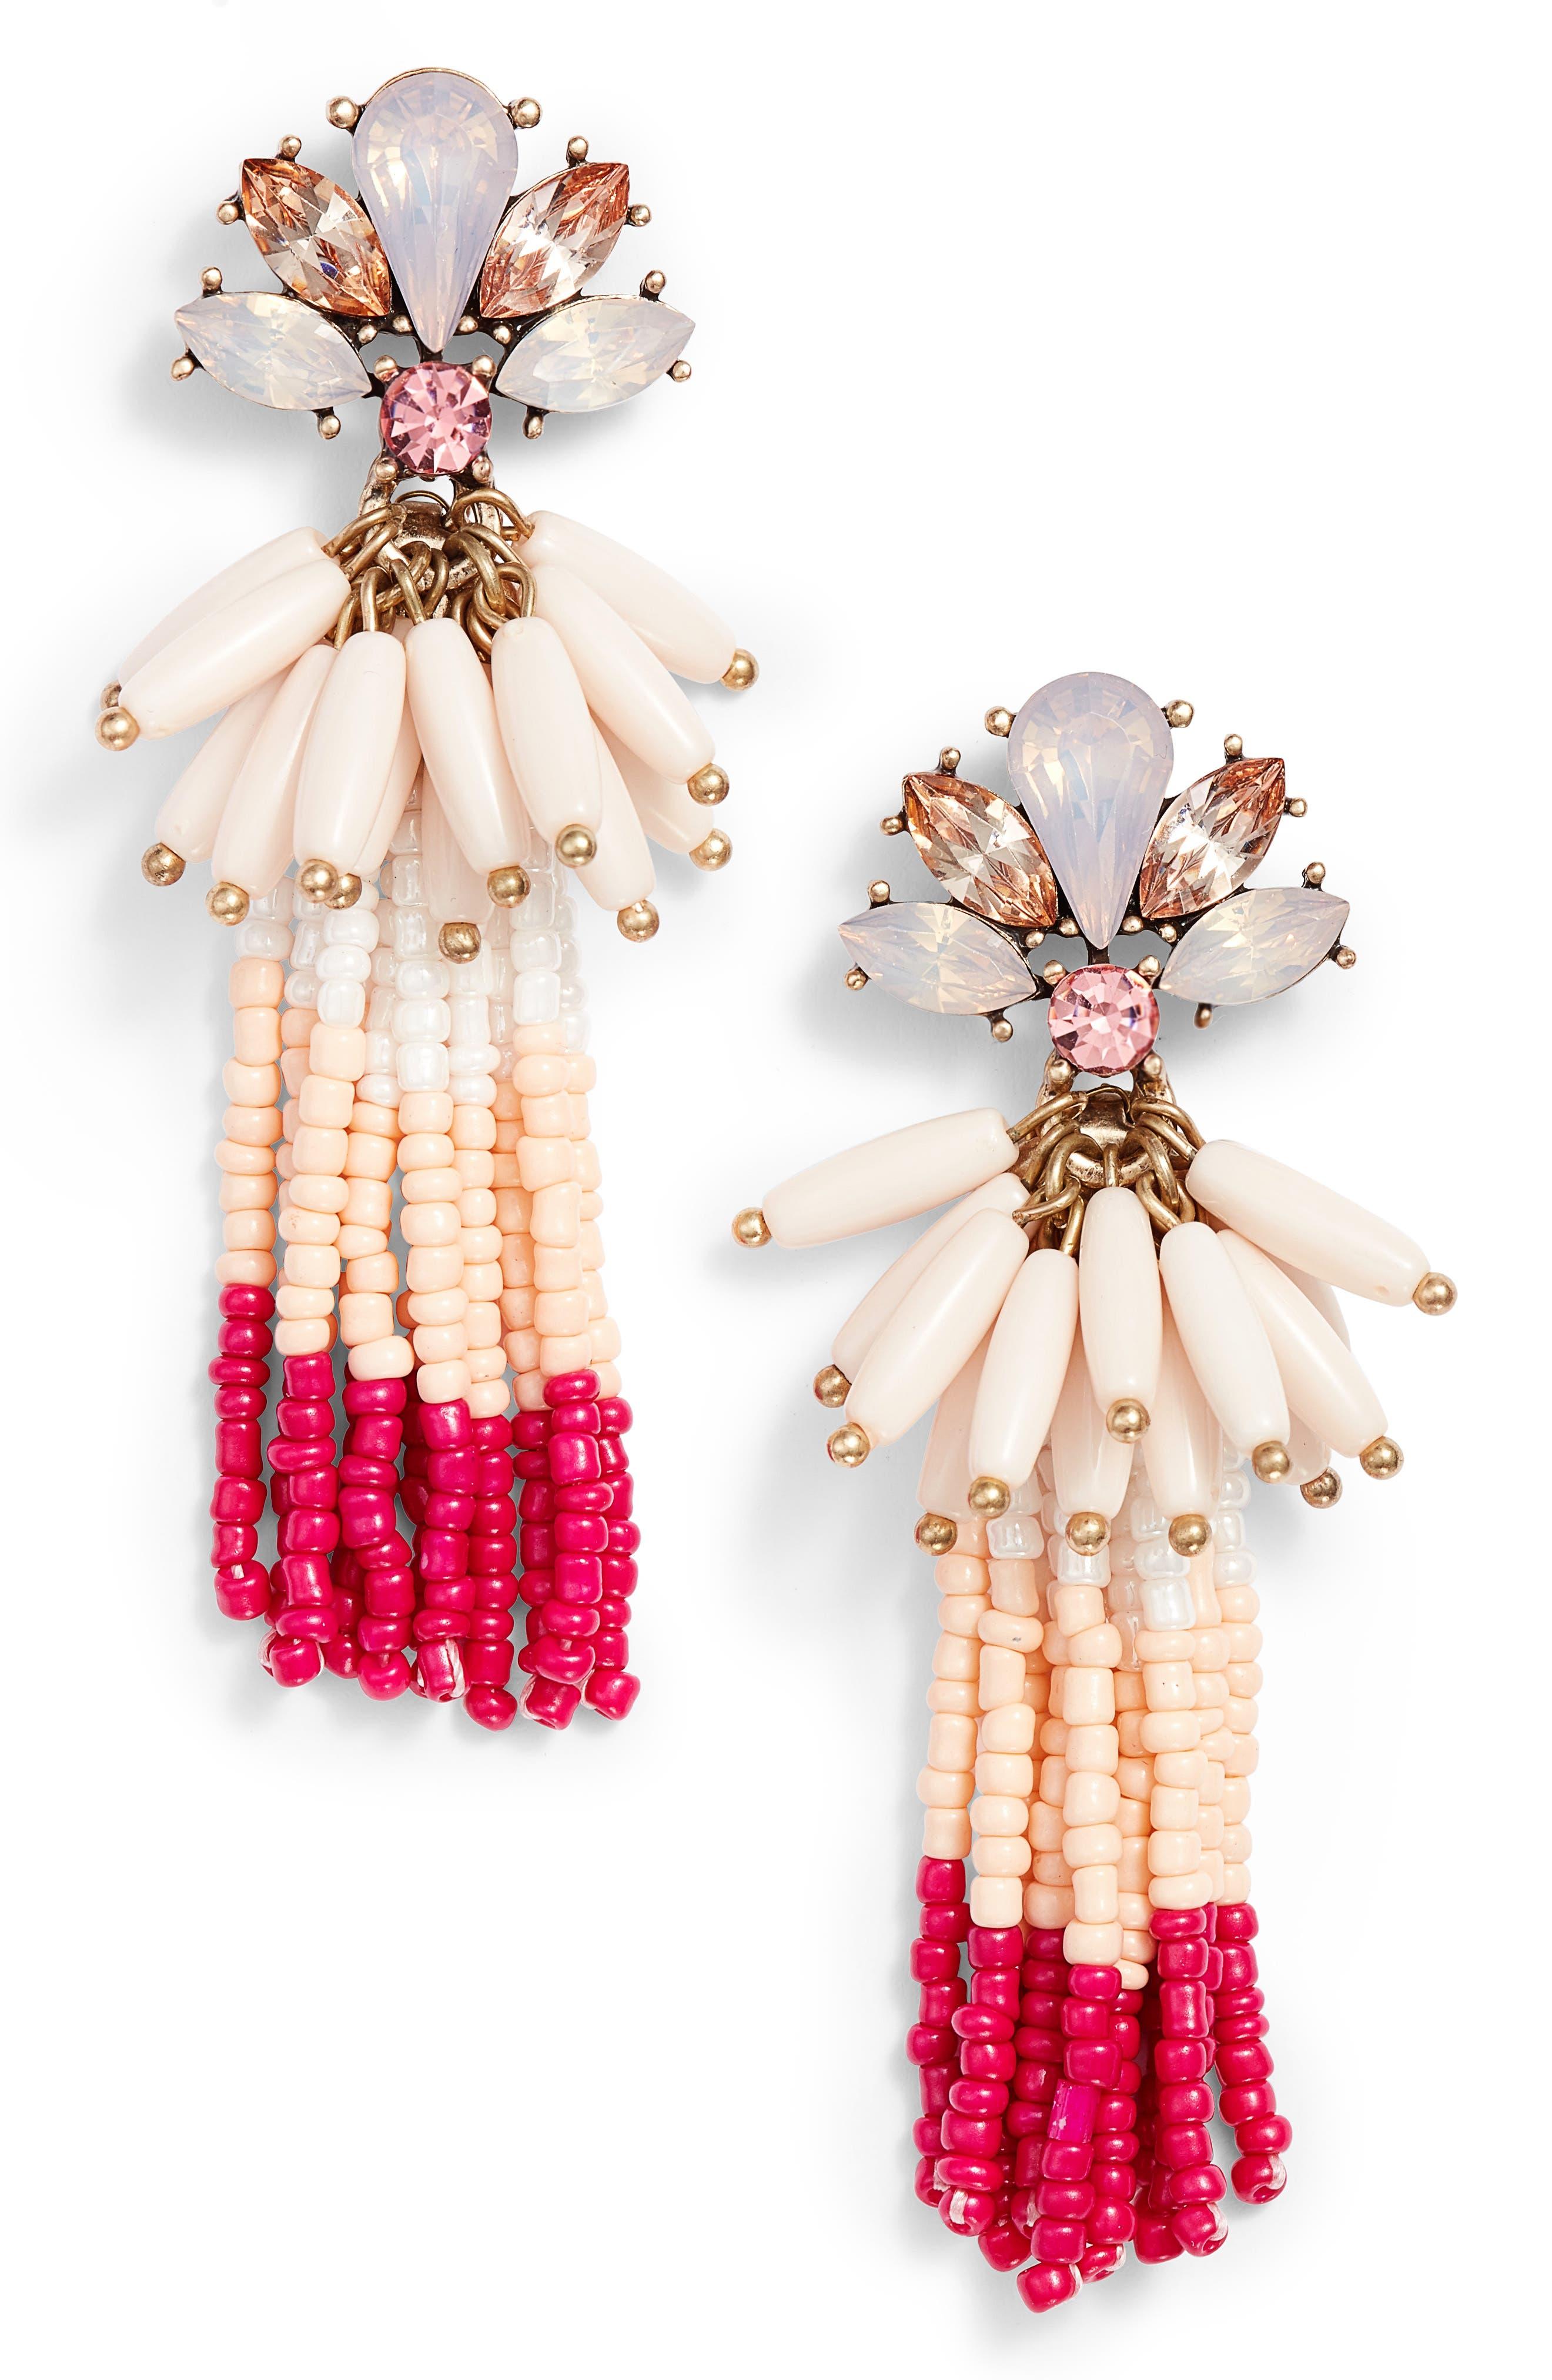 Crystal Flower Beaded Tassel Earrings,                             Main thumbnail 1, color,                             710